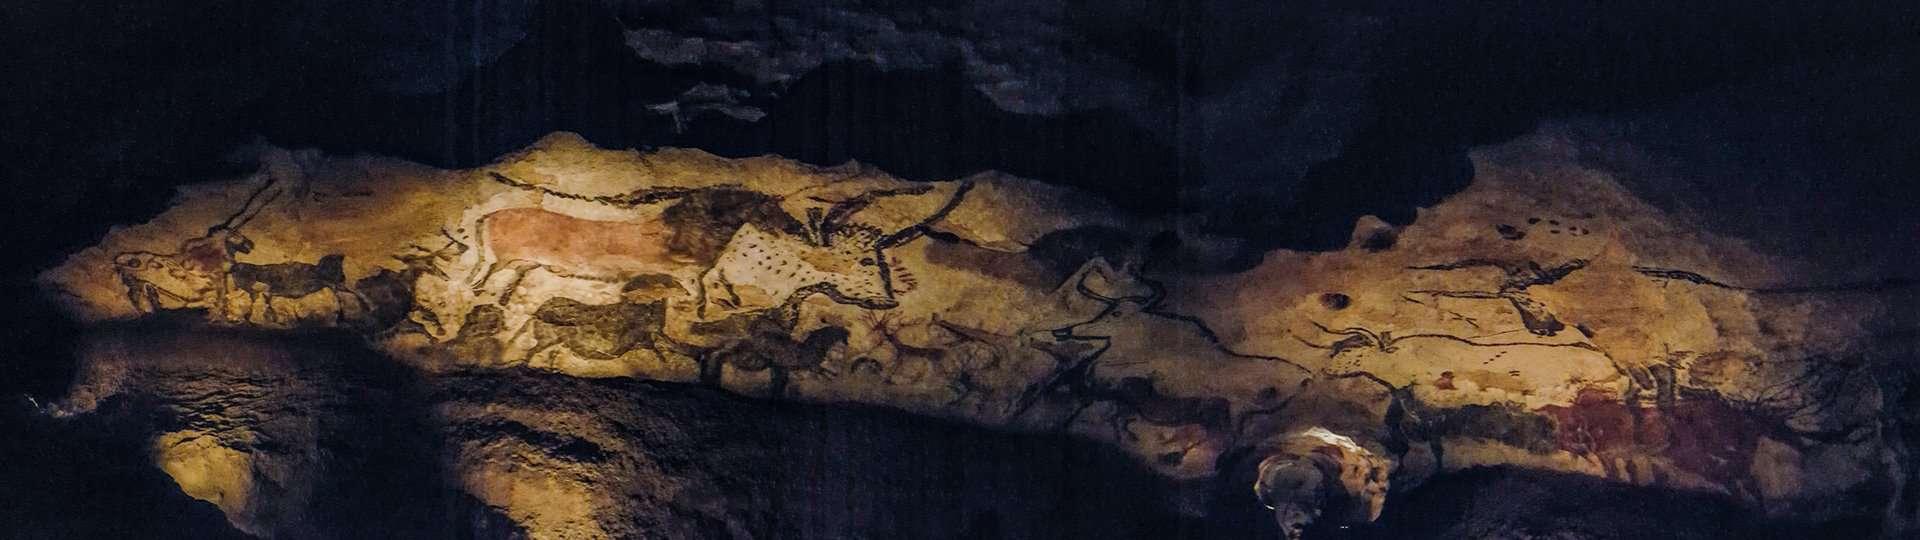 Archaeology Travel   Visiting Rock Art Around the World   6